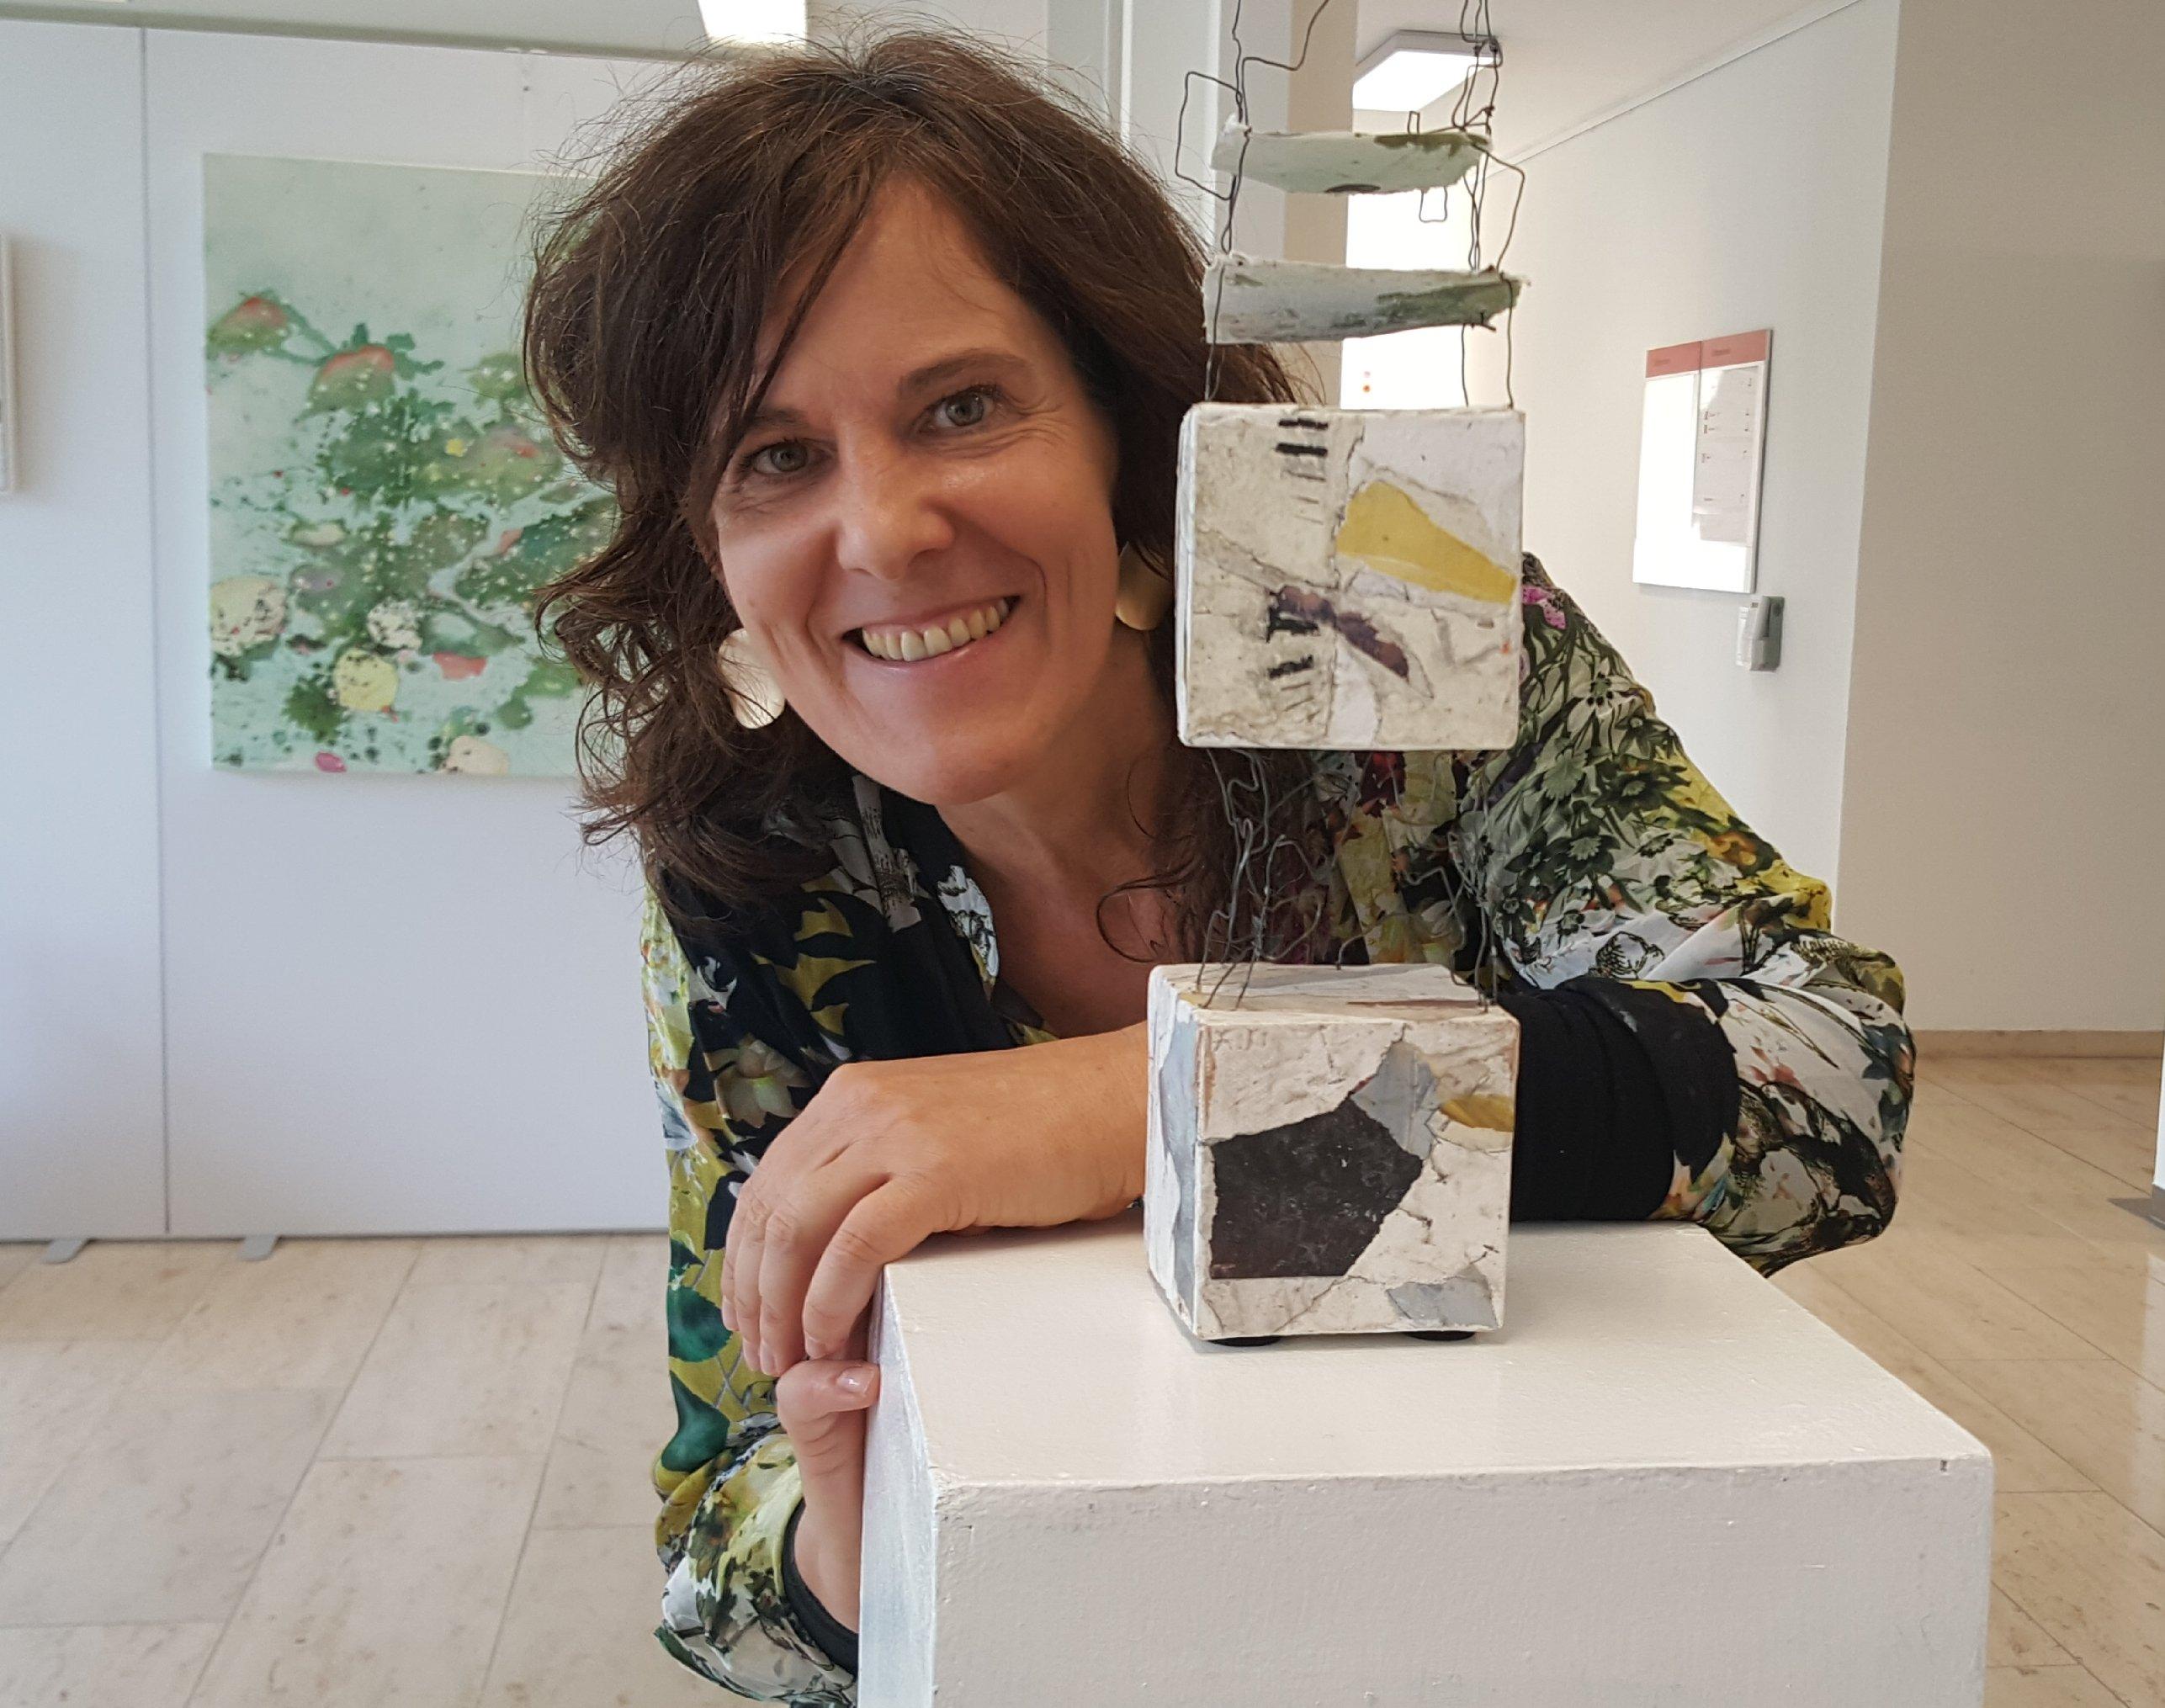 Sabine Endres mit eine ihrer filigranen Skulpturen - Foto: Jörg Bockow